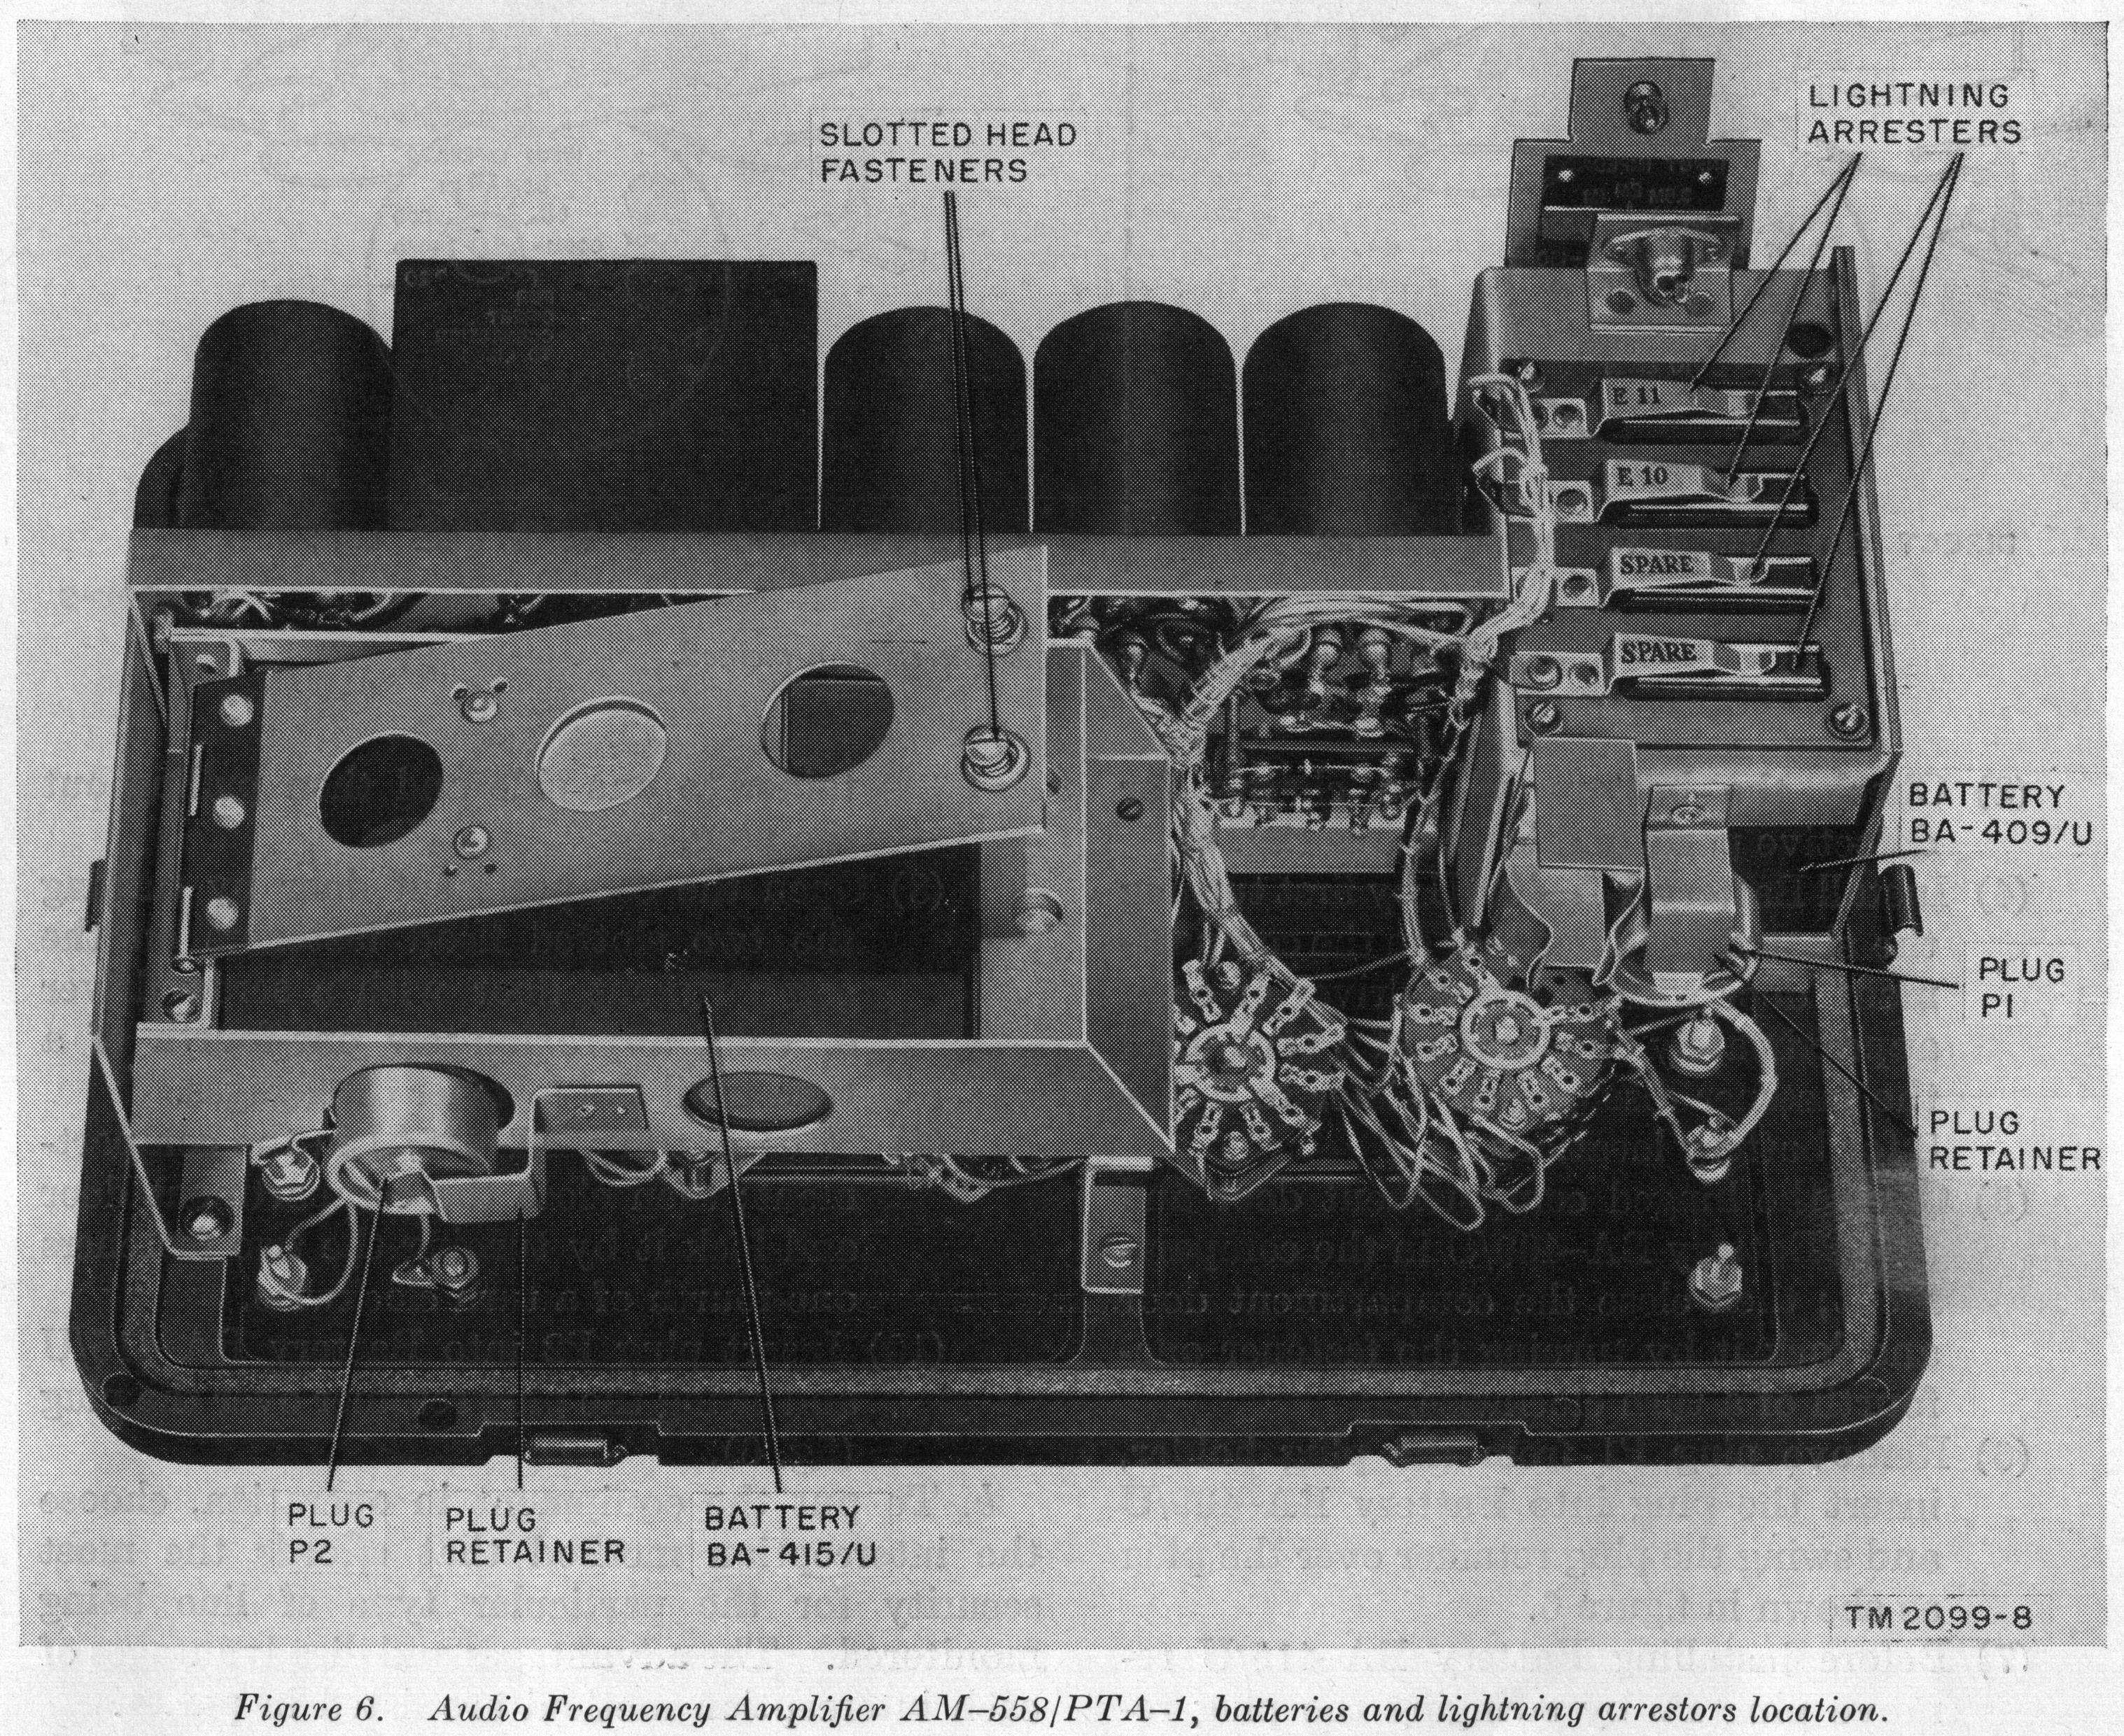 Audio Frequency Amplifier AM-558/PTA-1, batteries and lightning arrestors location.